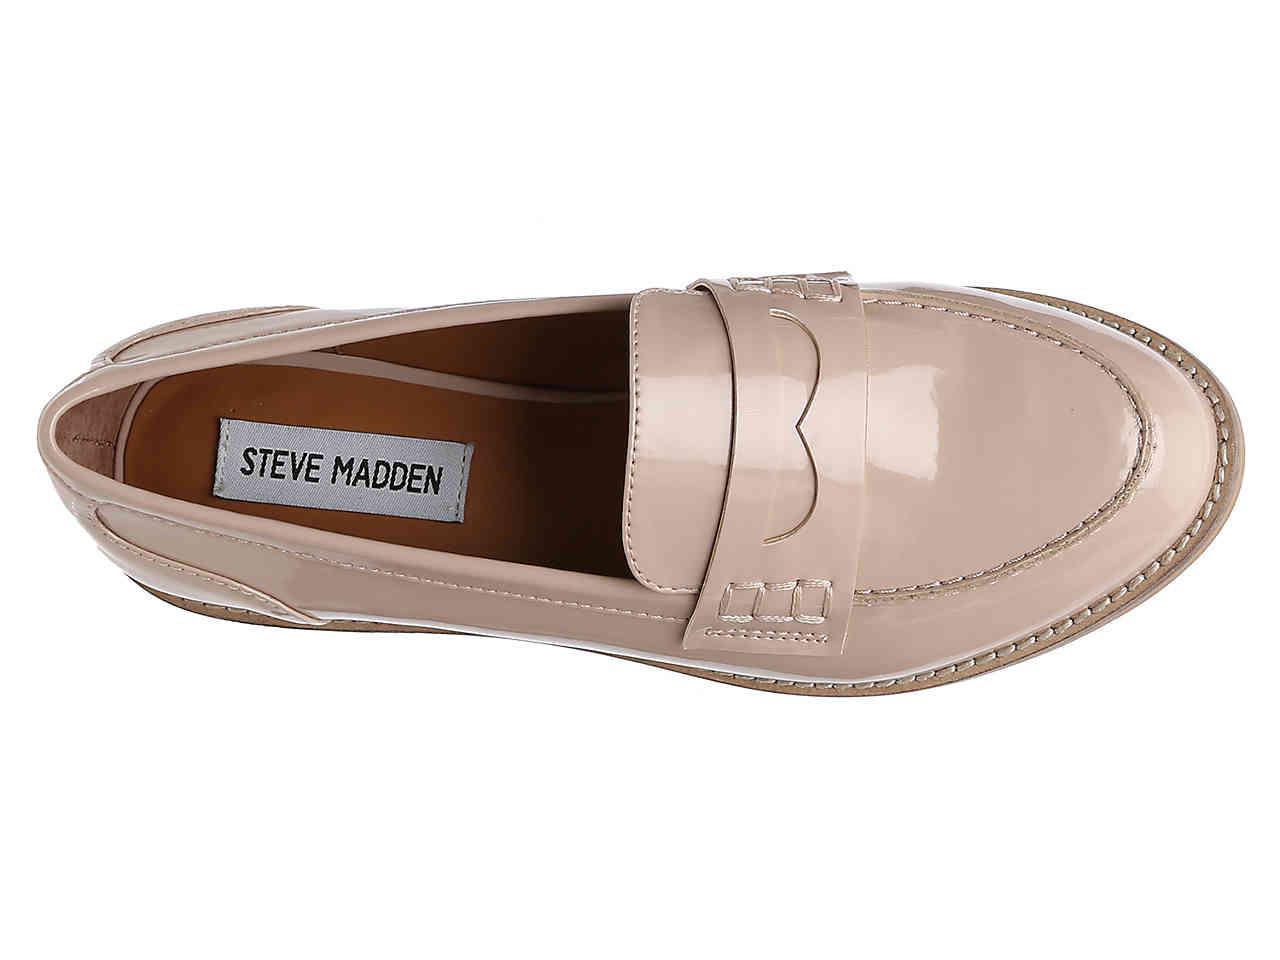 407e0fc5c8c Steve Madden Multicolor Cyylo Loafer